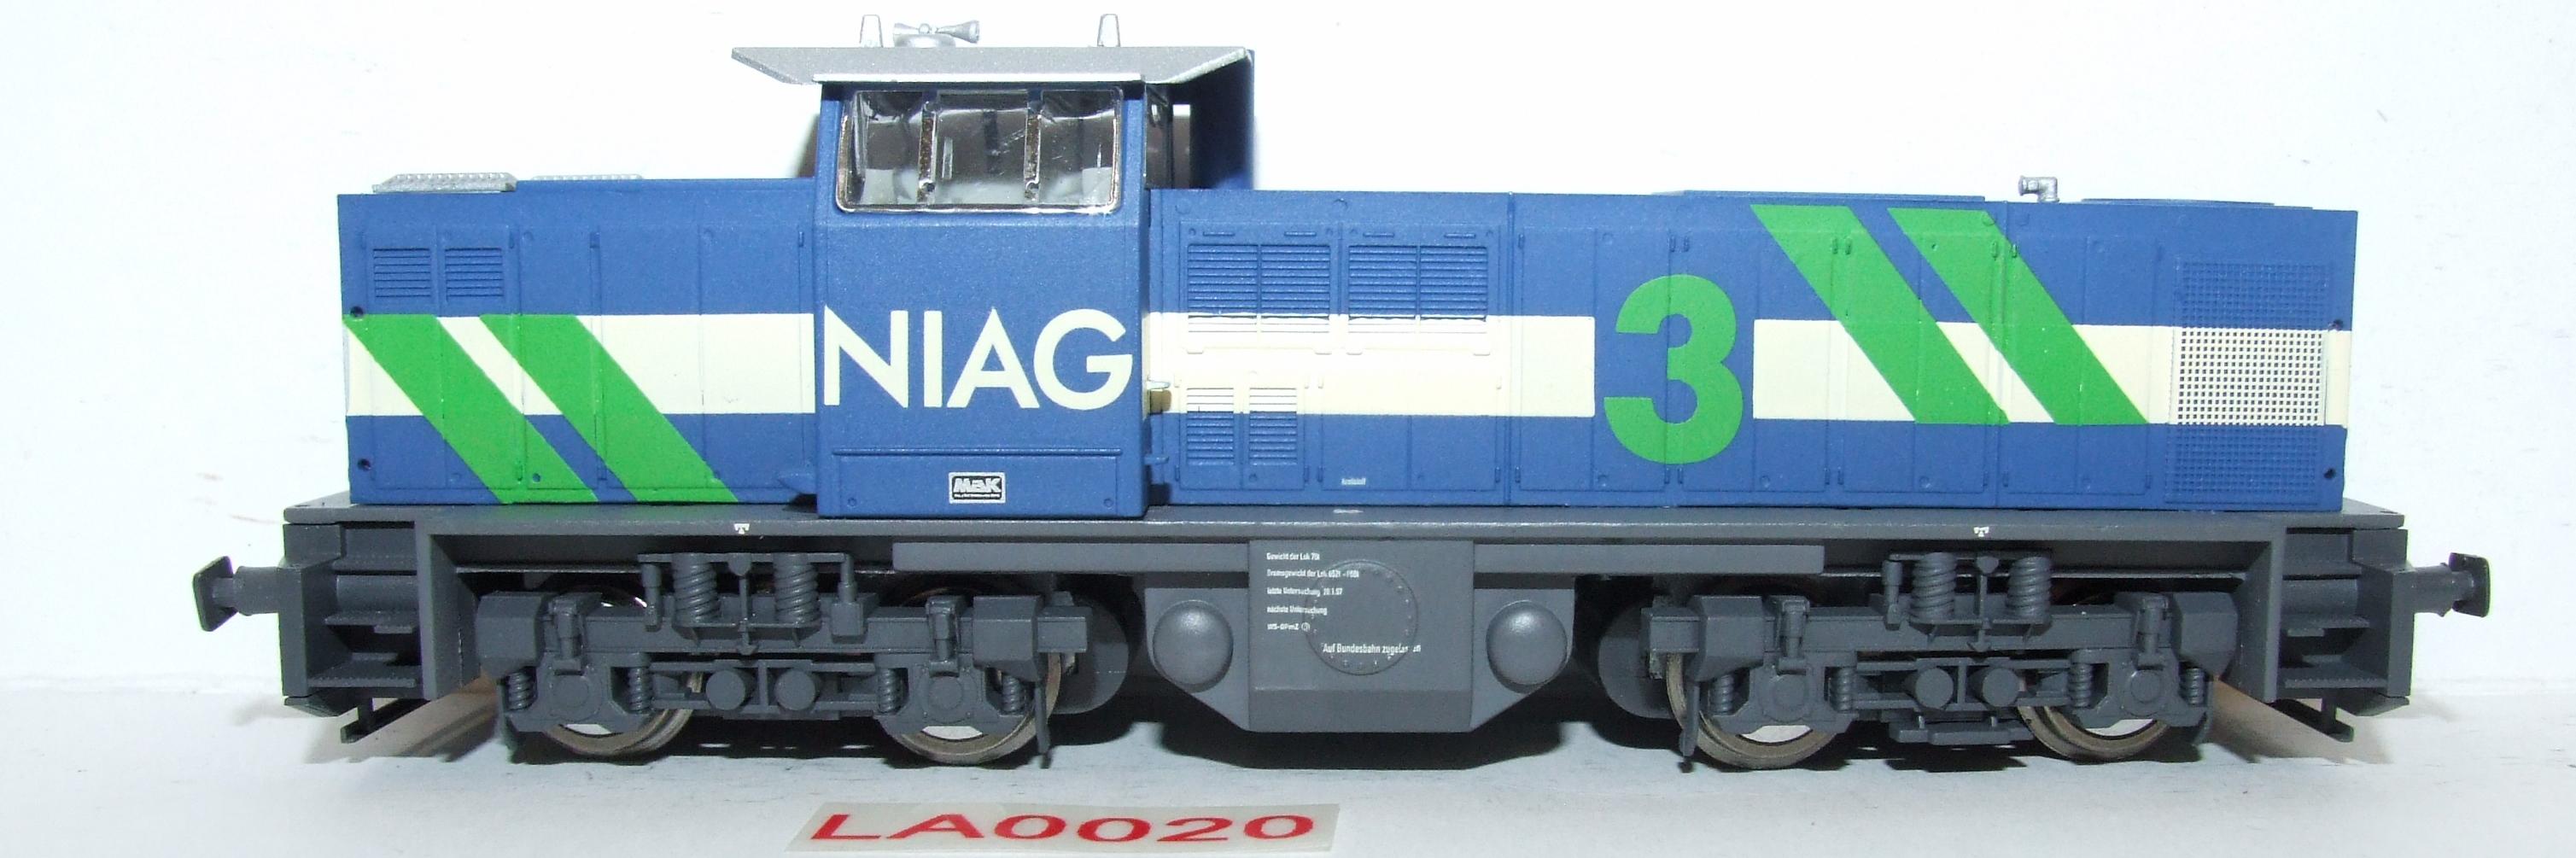 LA0020 Liliput H0 L 112411 Diesellok MAK NIAG DC in OVP